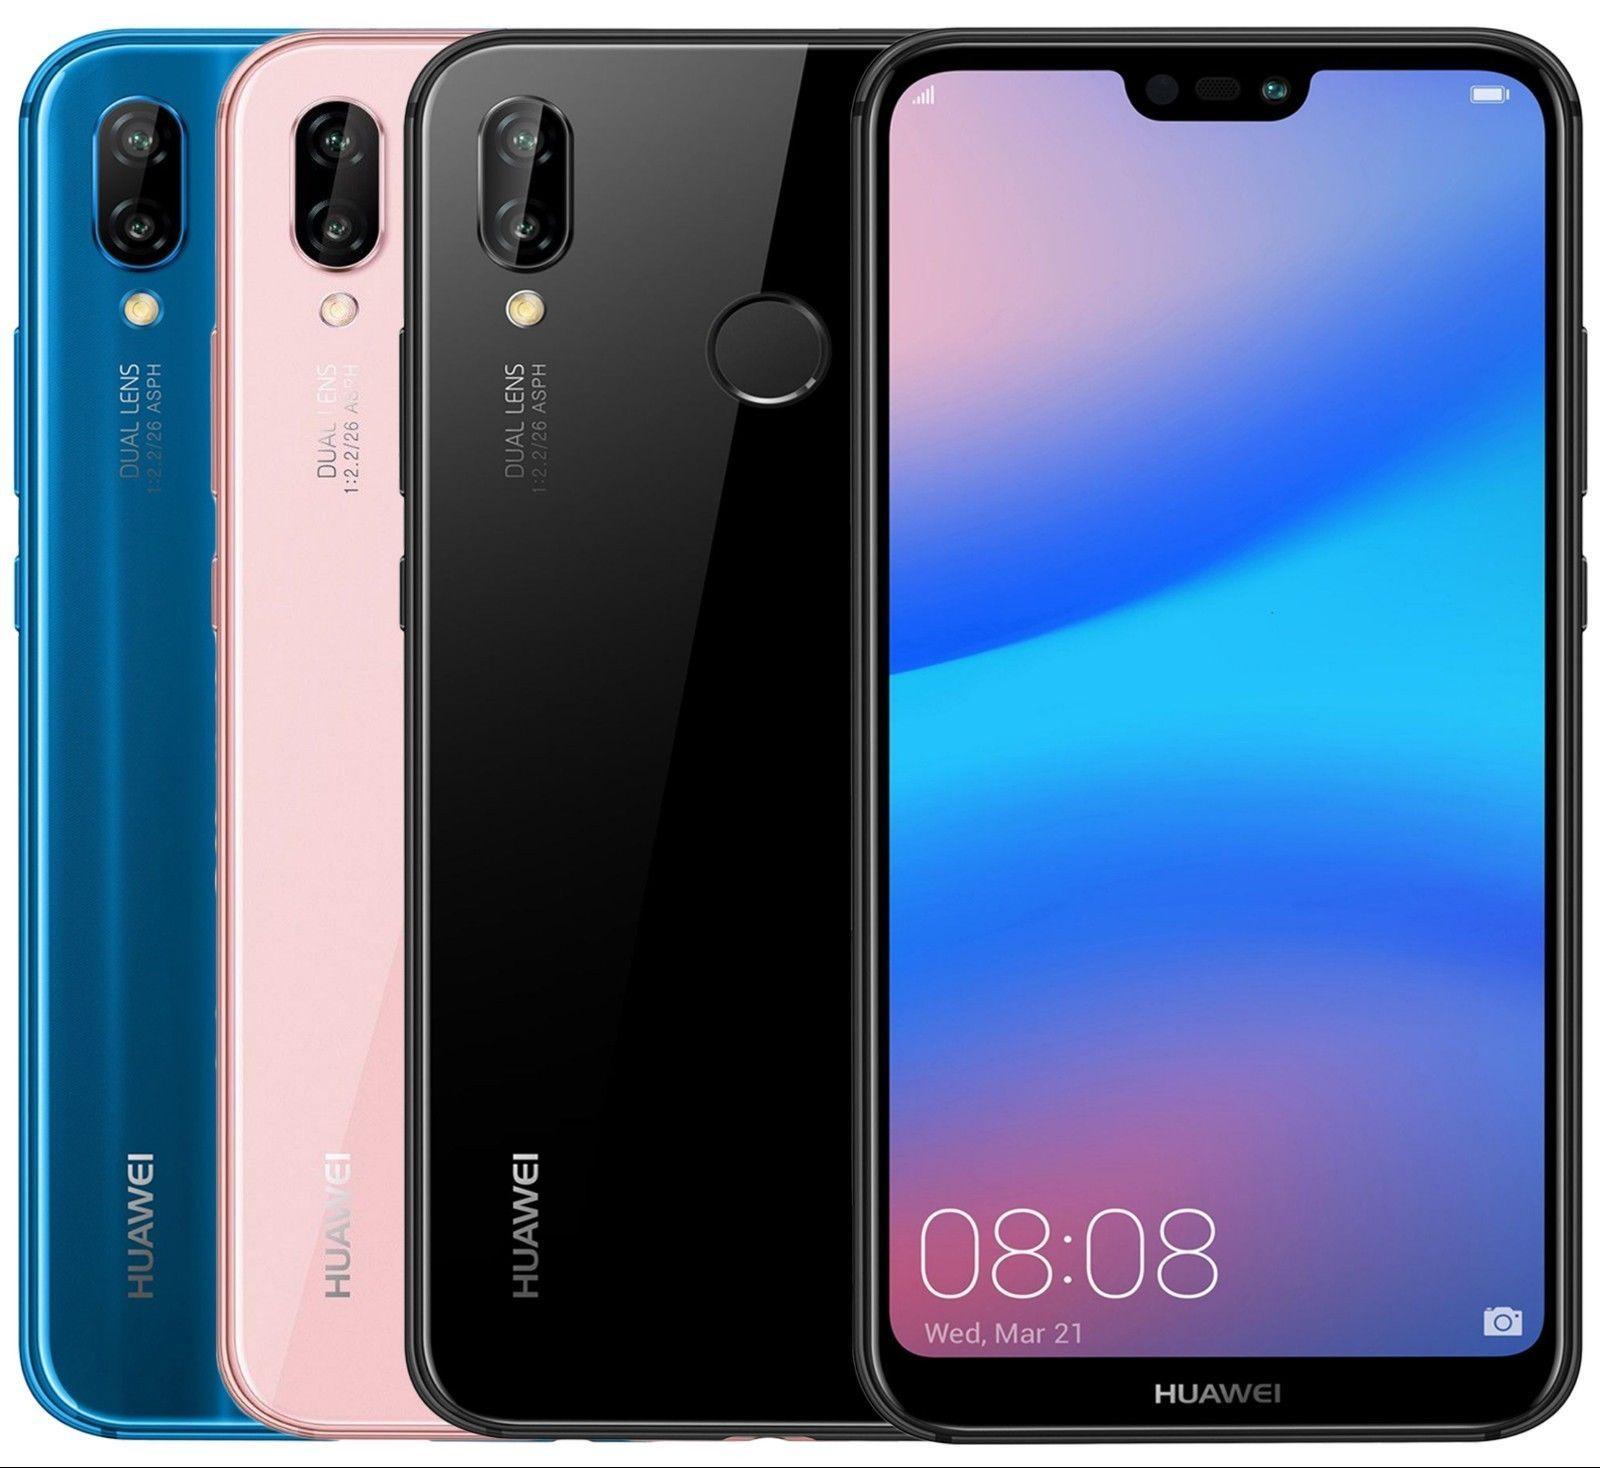 Huawei P20 Lite Ane Lx3 Dual Sim Factory Unlocked 5 8 4gb Ram Black Blue Pink Dual Sim Huawei Unlock